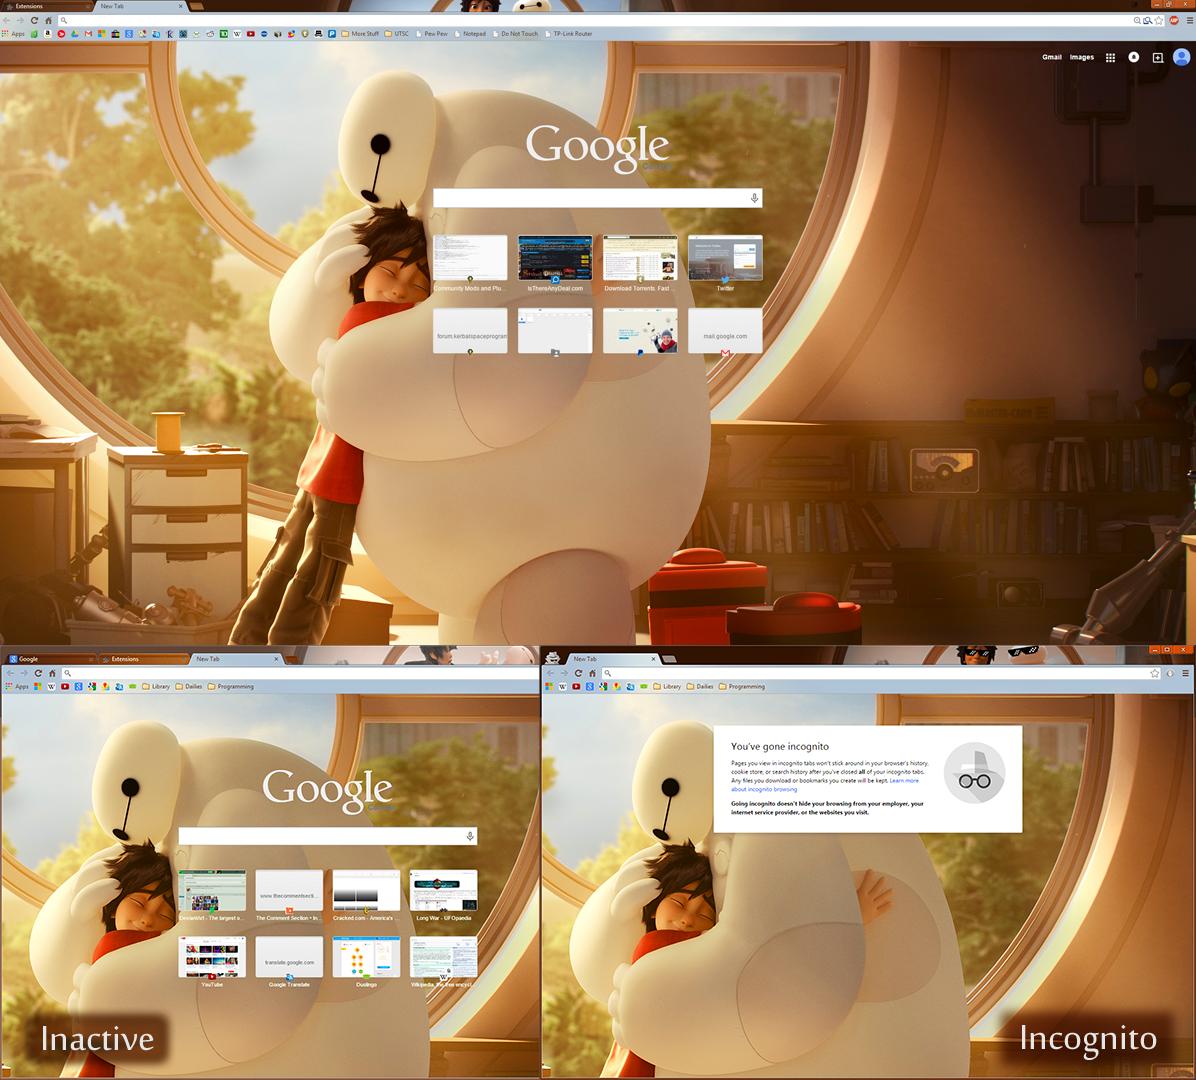 Gmail theme gone -  Reboot Chrome Theme By Tumthe3